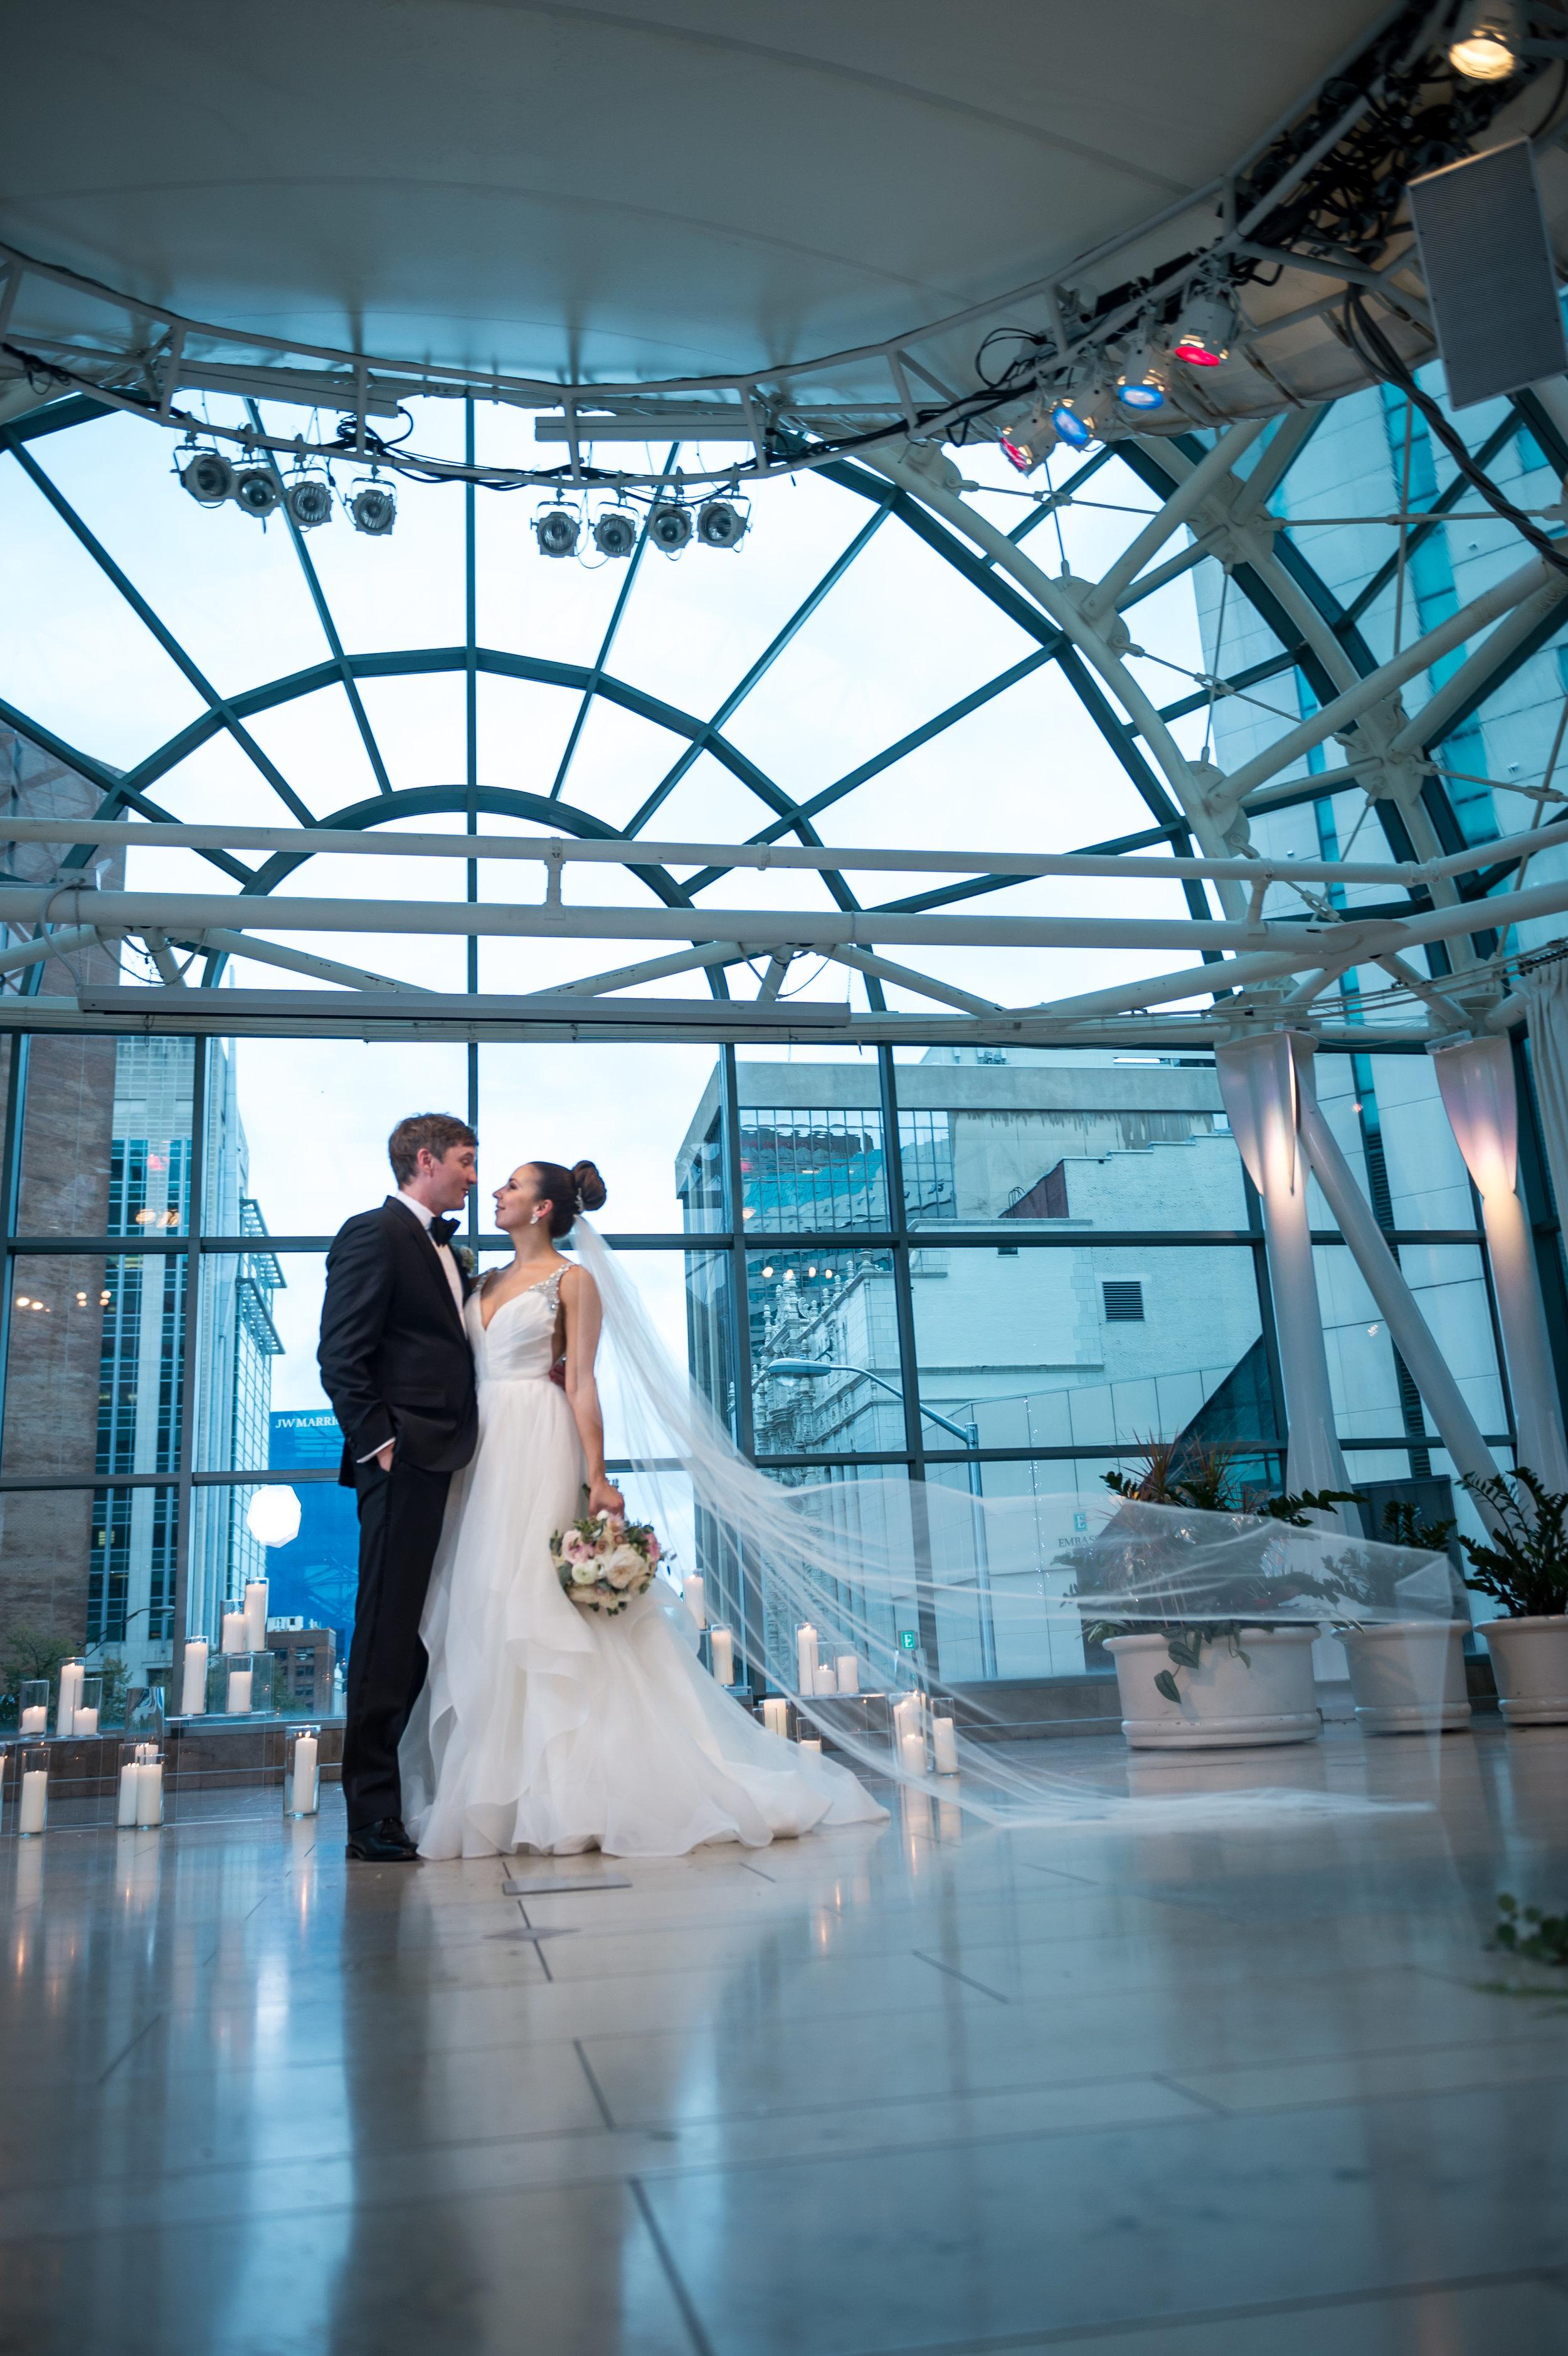 DaussFOTO Wedding Photography_20180908_0629.jpg